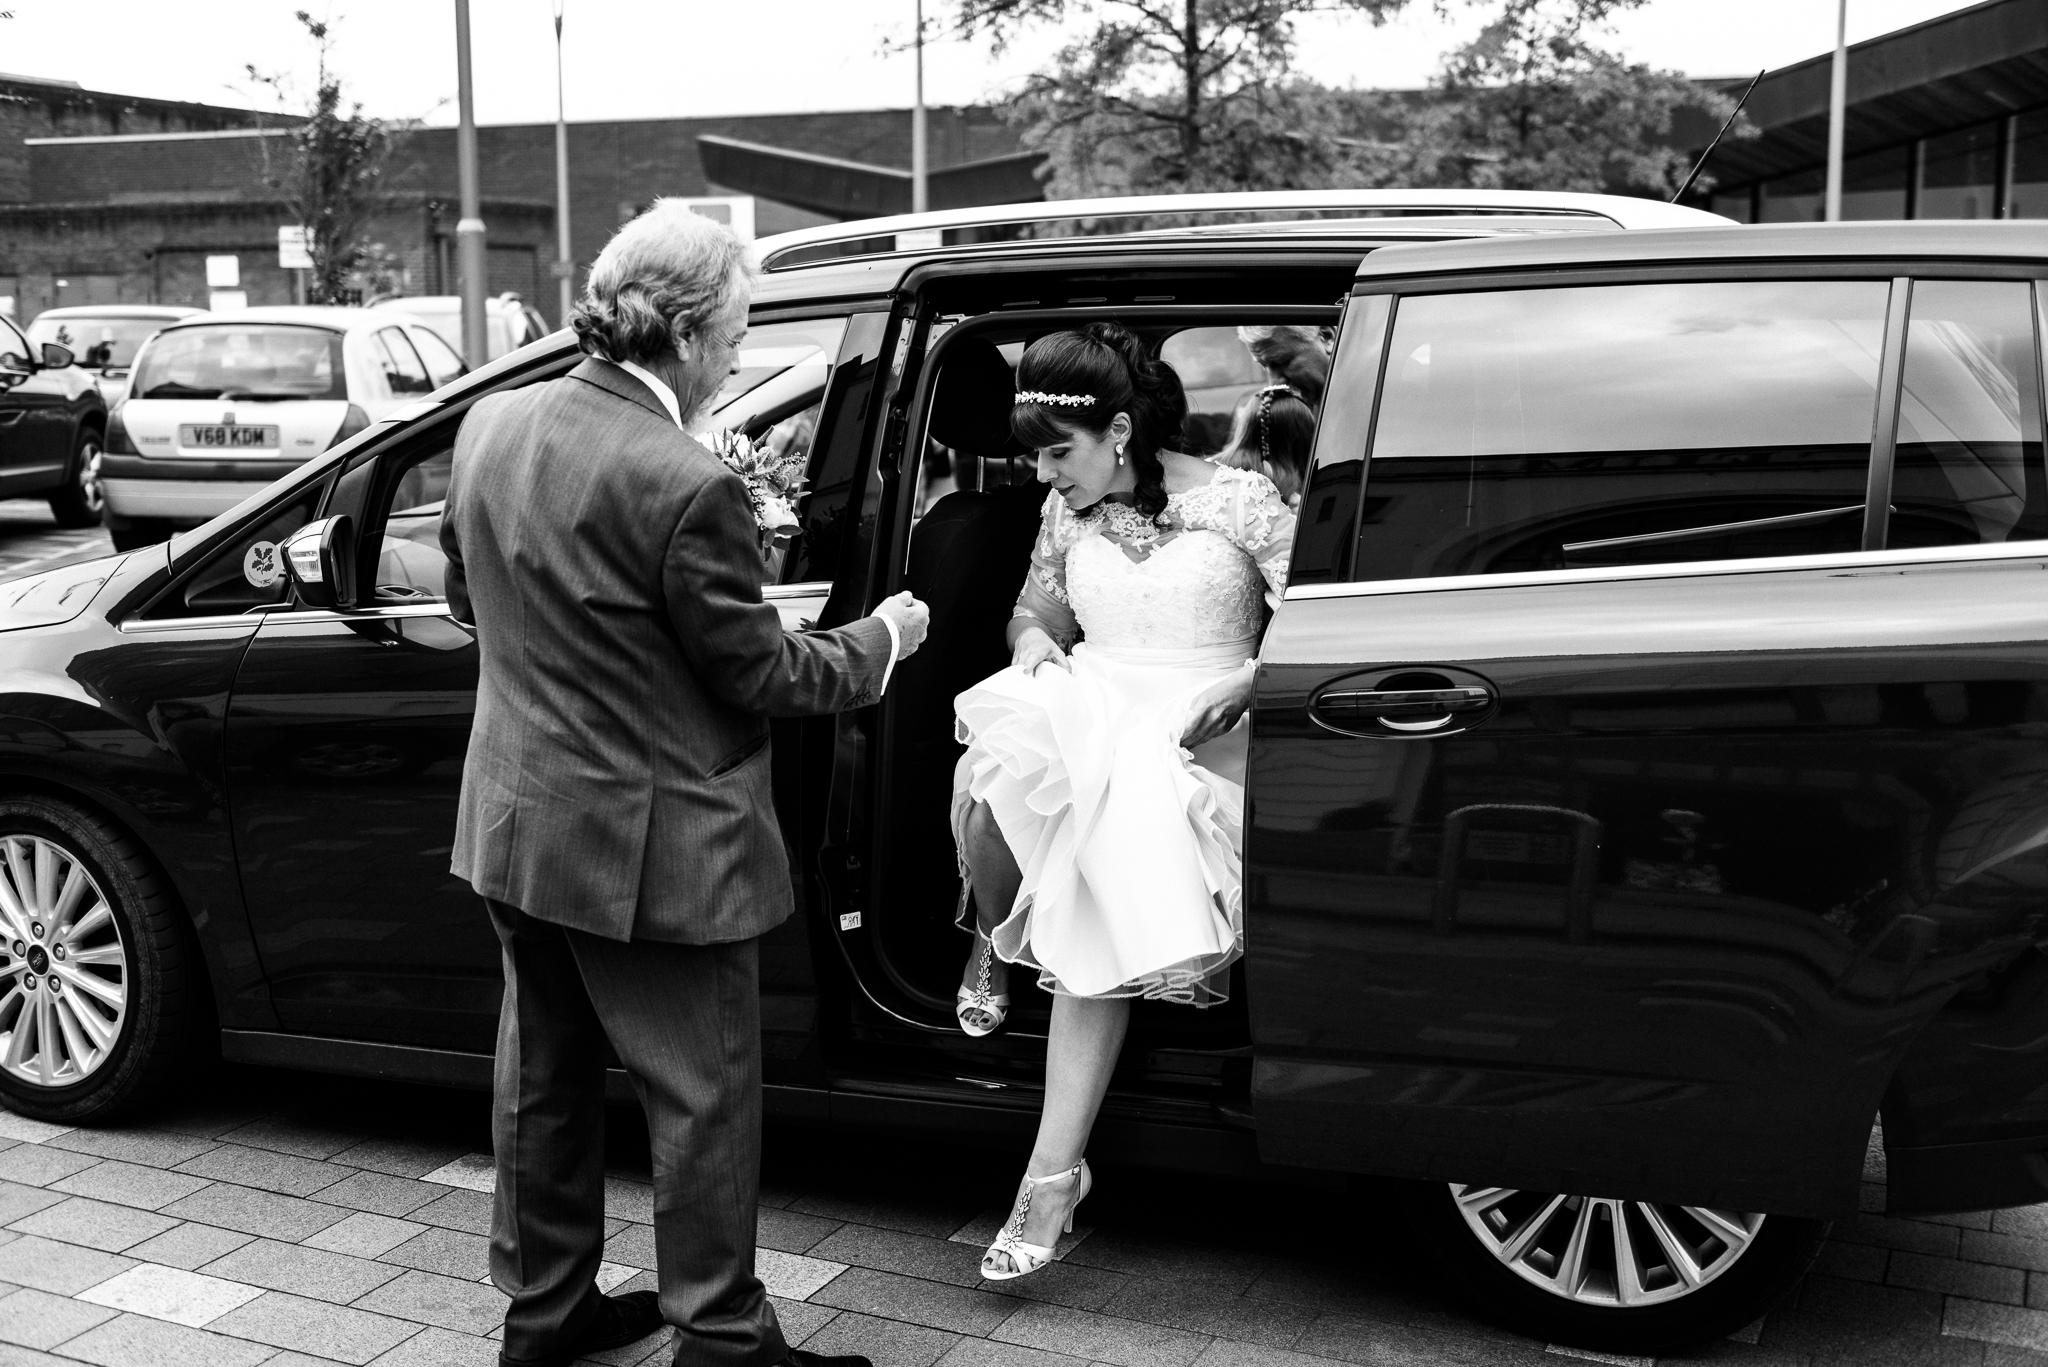 Cheshire Wedding Photography at Crewe Lyceum Theatre Stage Wedding Art Deco 20s - Jenny Harper-13.jpg